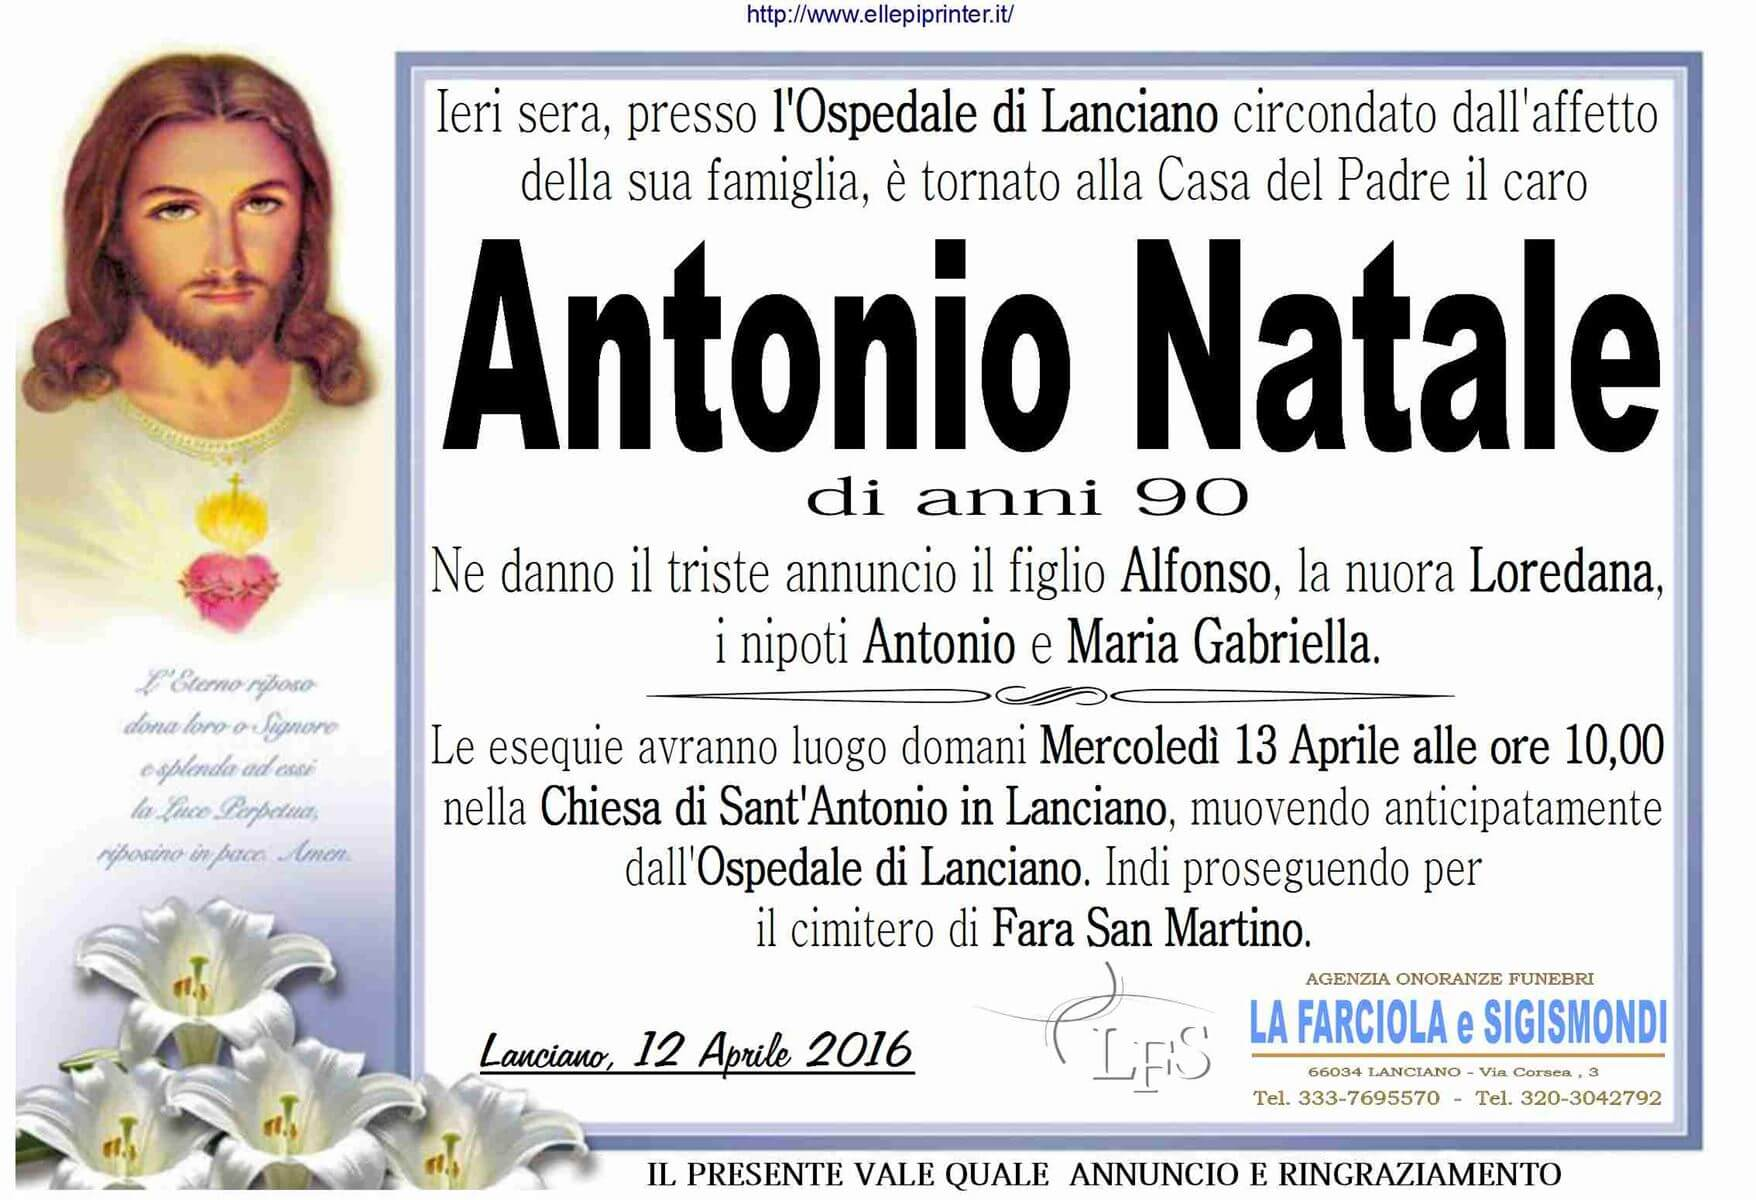 MANIFESTO NATALE ANTONIO